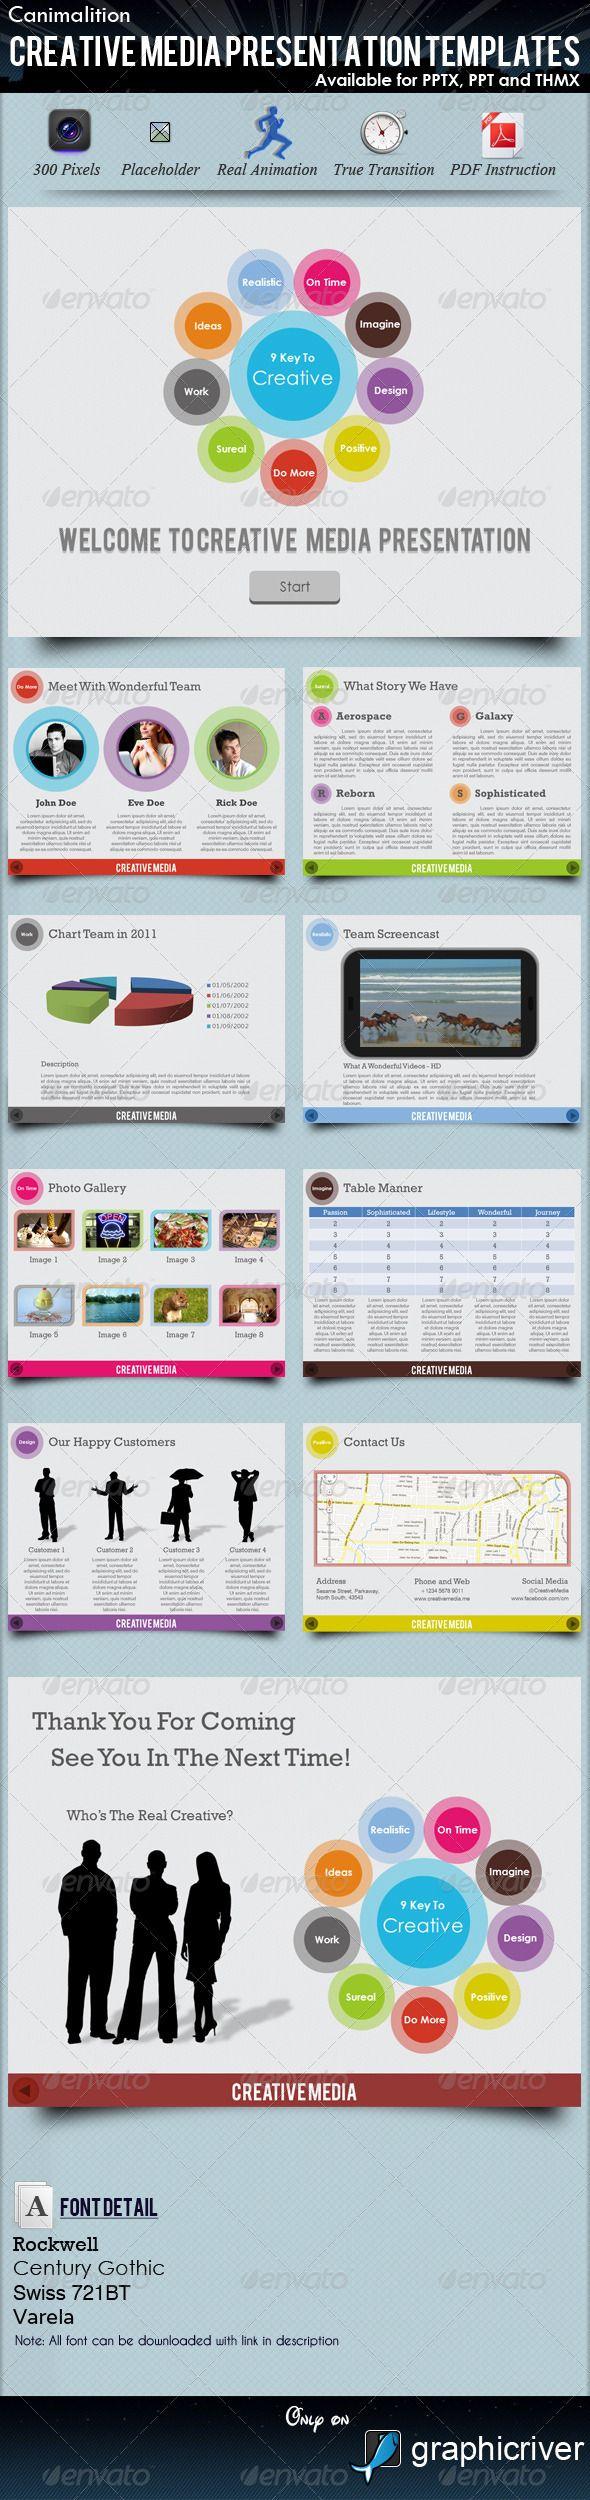 Creative Media Presentation Templates